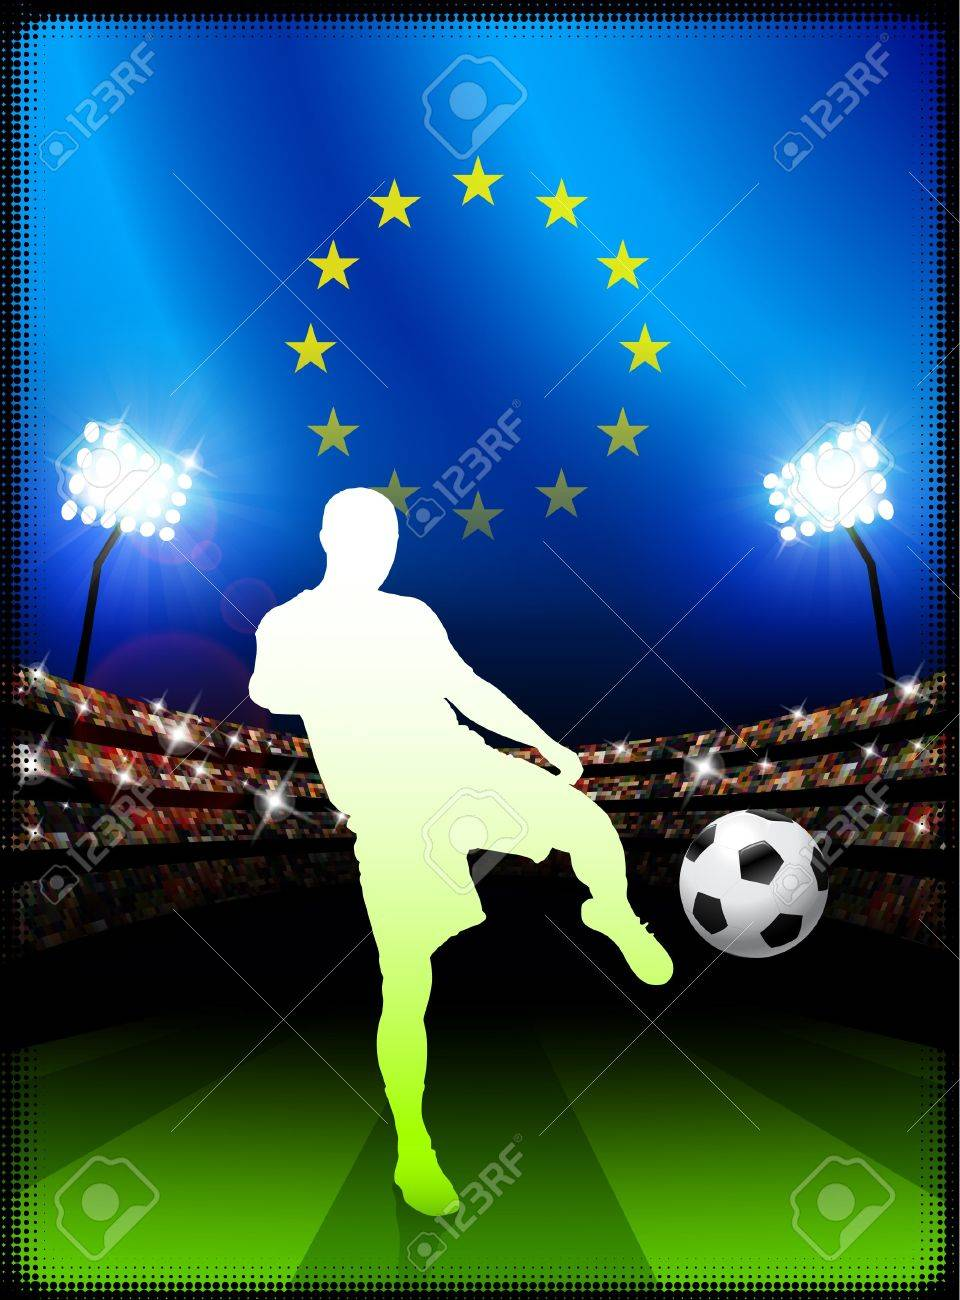 European Union Soccer Player with Flag on Stadium BackgroundOriginal Illustration Stock Illustration - 7264253